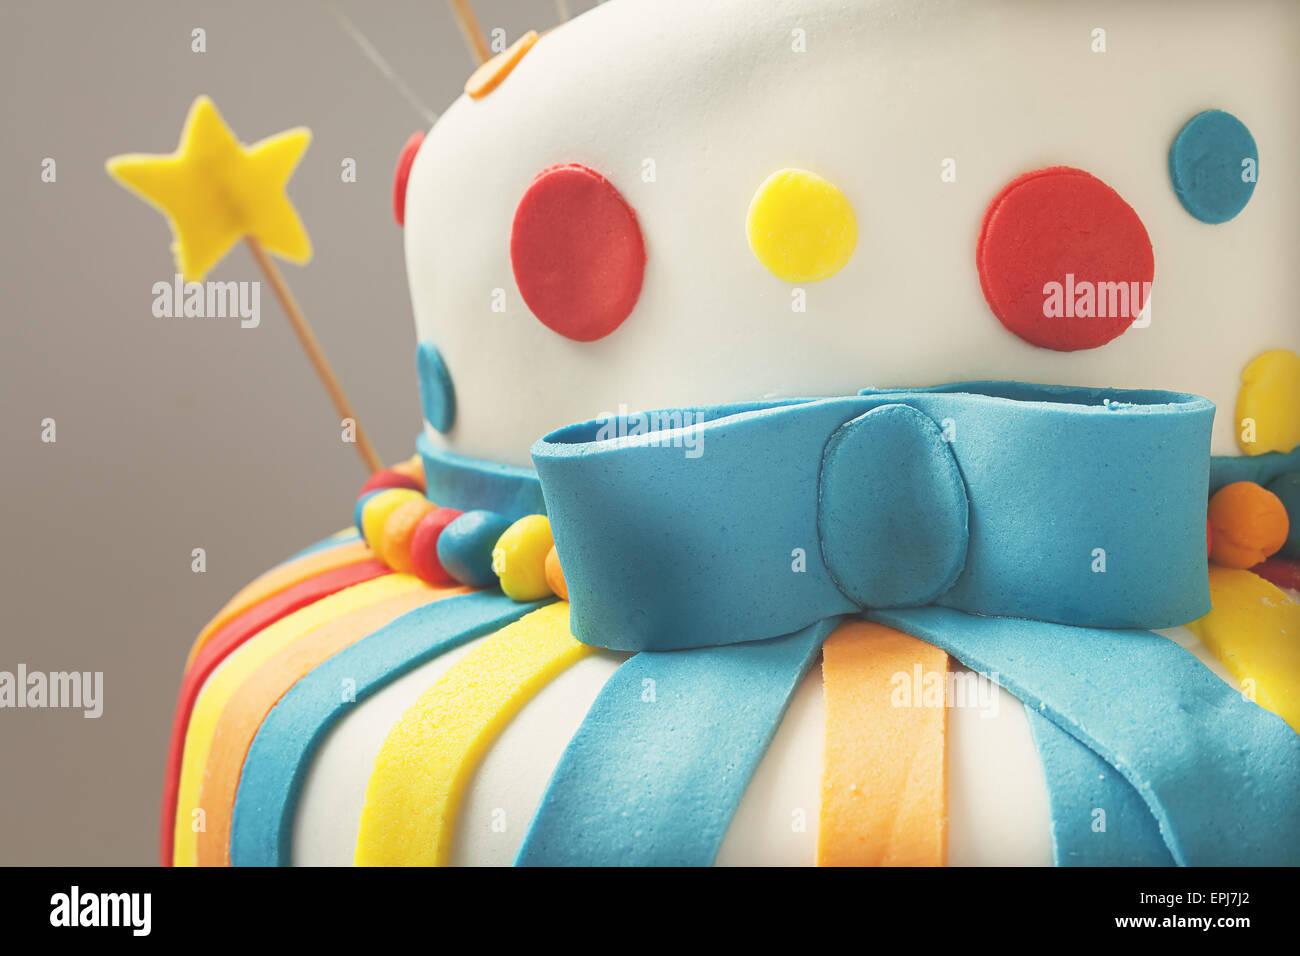 Wondrous Funny Birthday Cake Details Sweet Colorful Decoration Stock Photo Funny Birthday Cards Online Barepcheapnameinfo